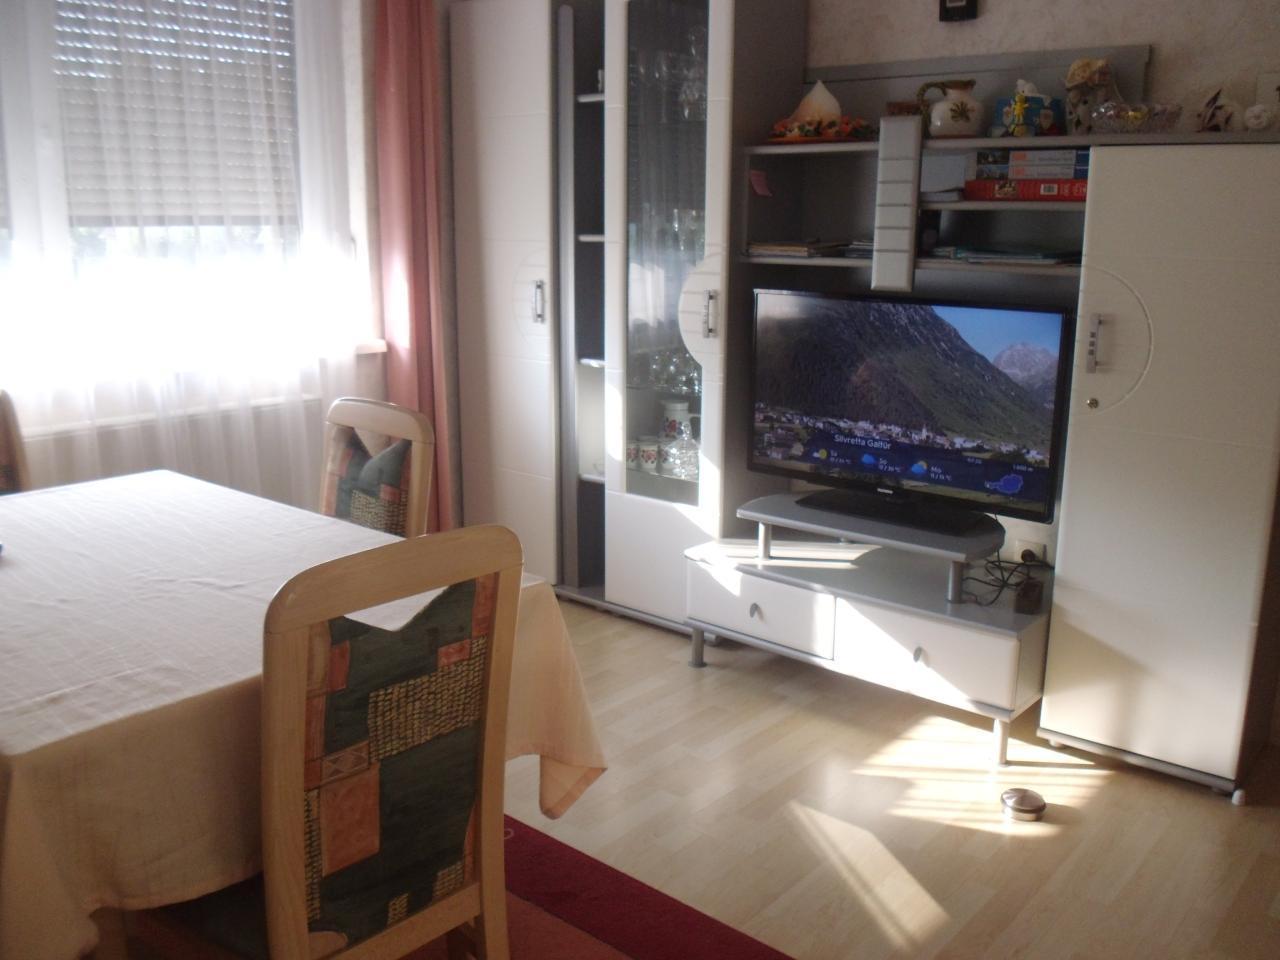 Appartement de vacances Appartement Draublick (500286), Neuhaus (Klopeiner See), Lac Klopein, Carinthie, Autriche, image 3